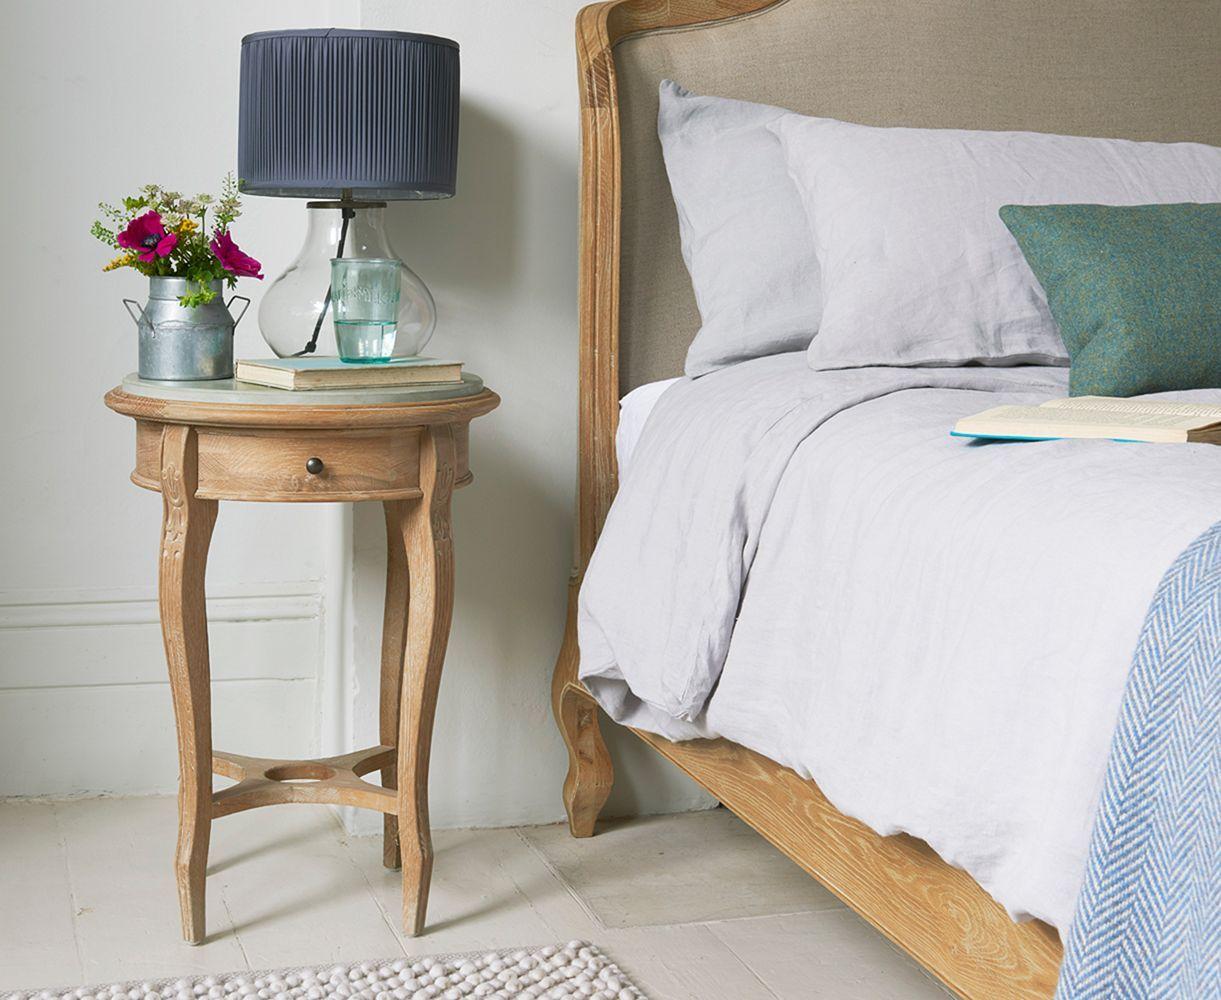 Best 10 Minimalist Bedroom Decoration Ideas Beside Table 640 x 480